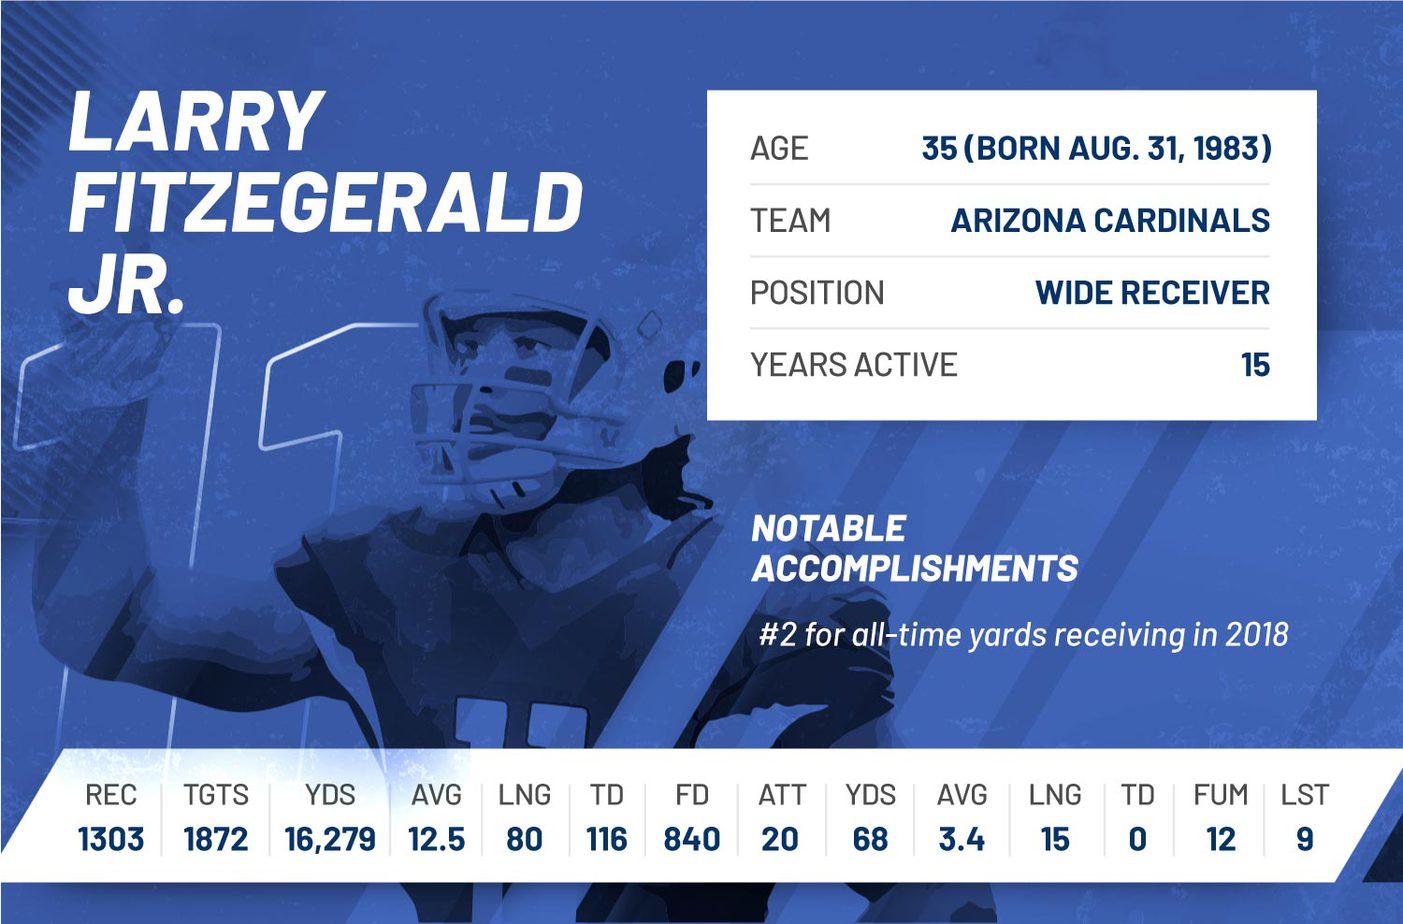 larry fitzgerald jr nfl 2018 regular season stats